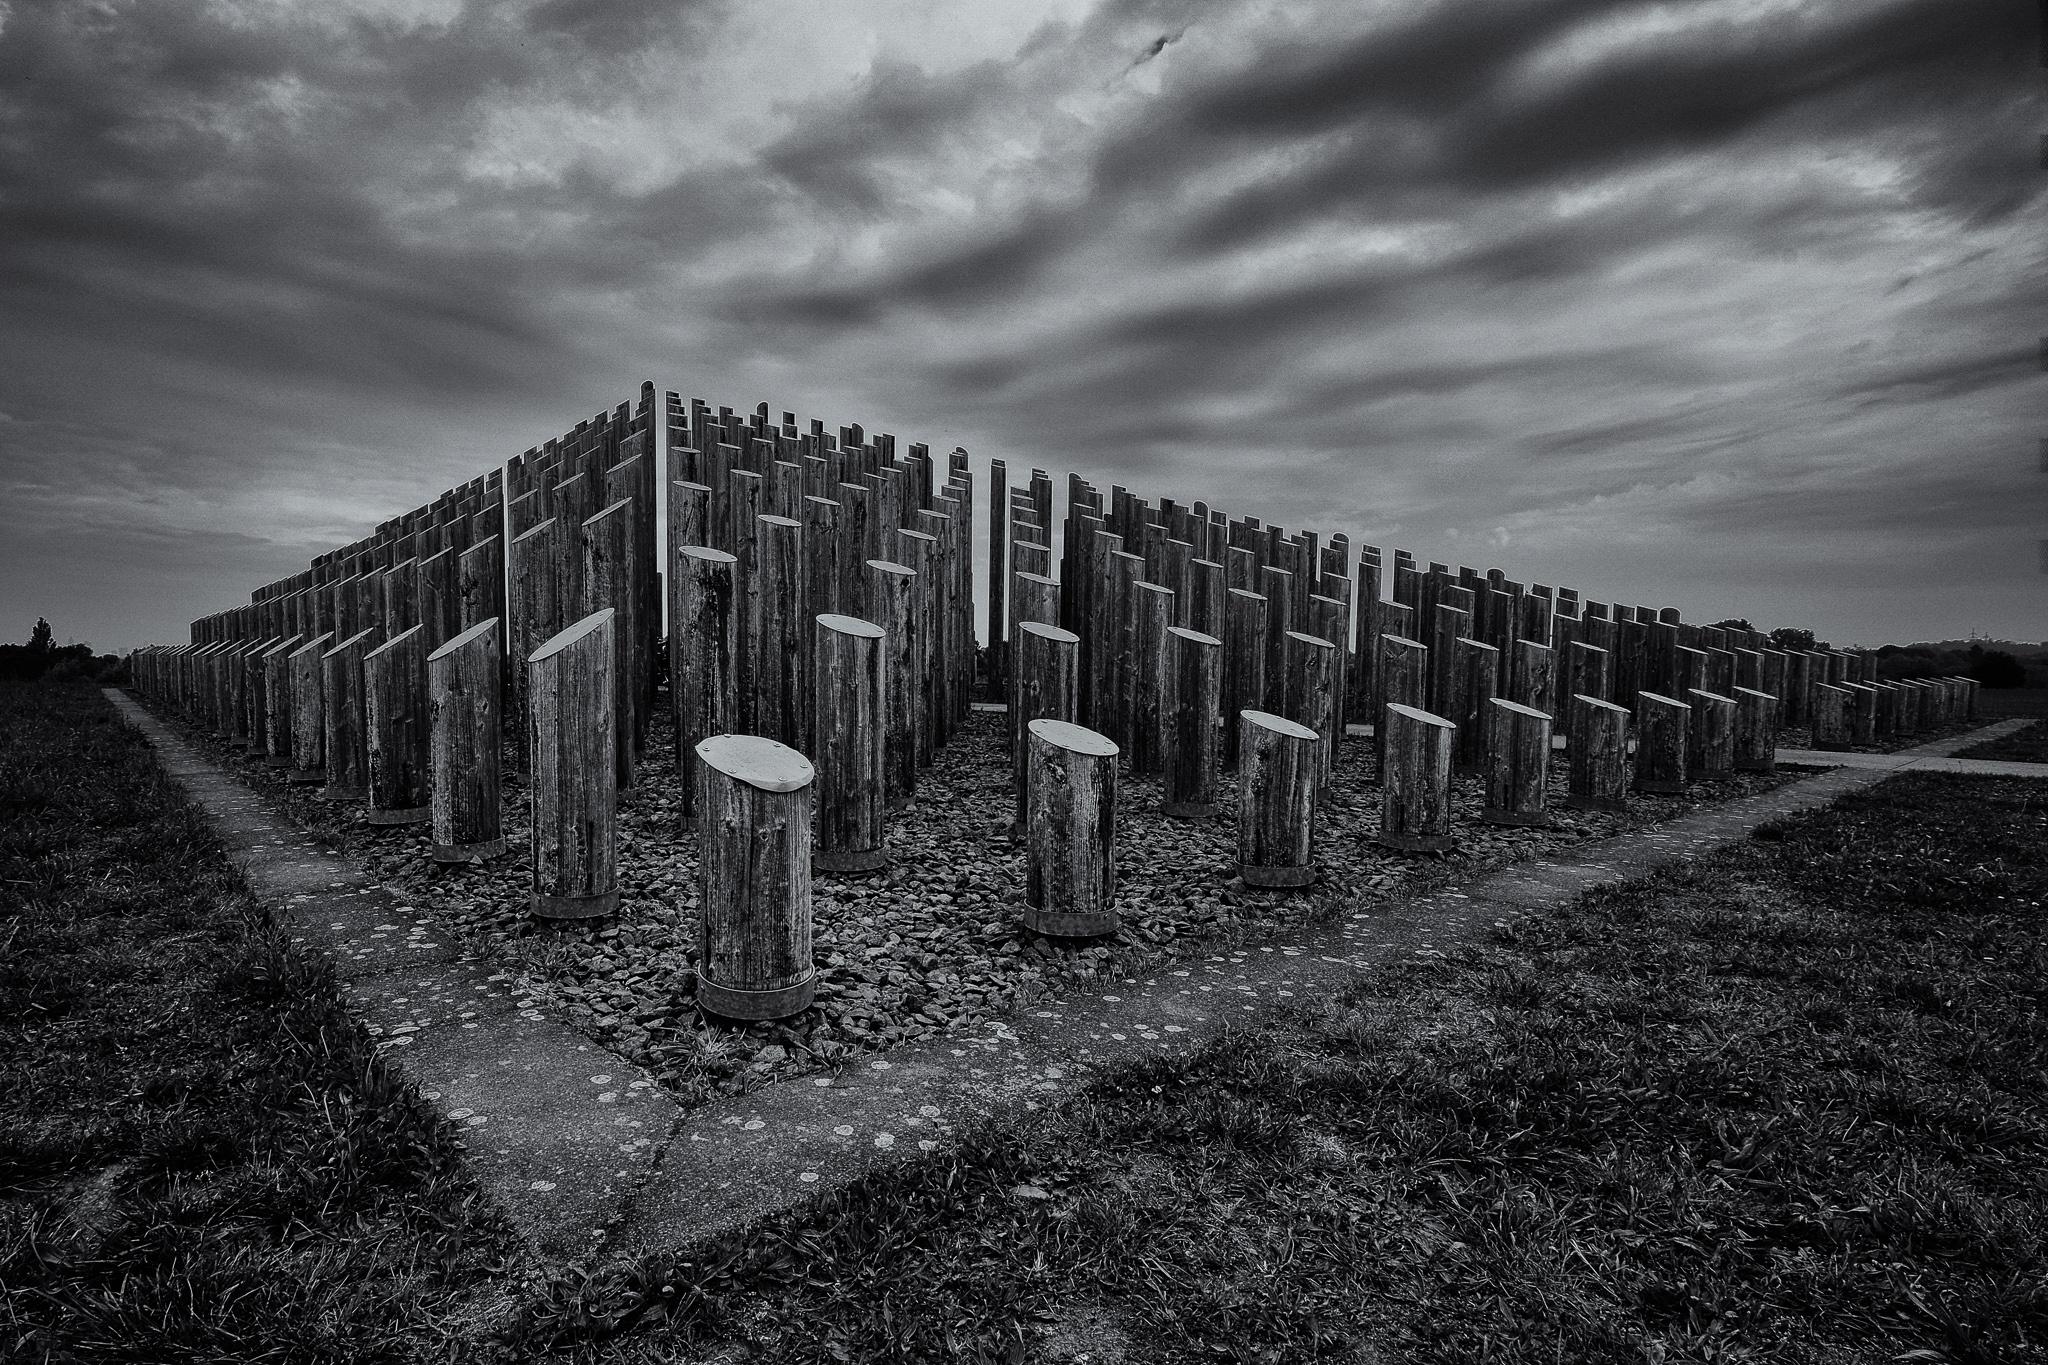 Stangenpyramide, Germany